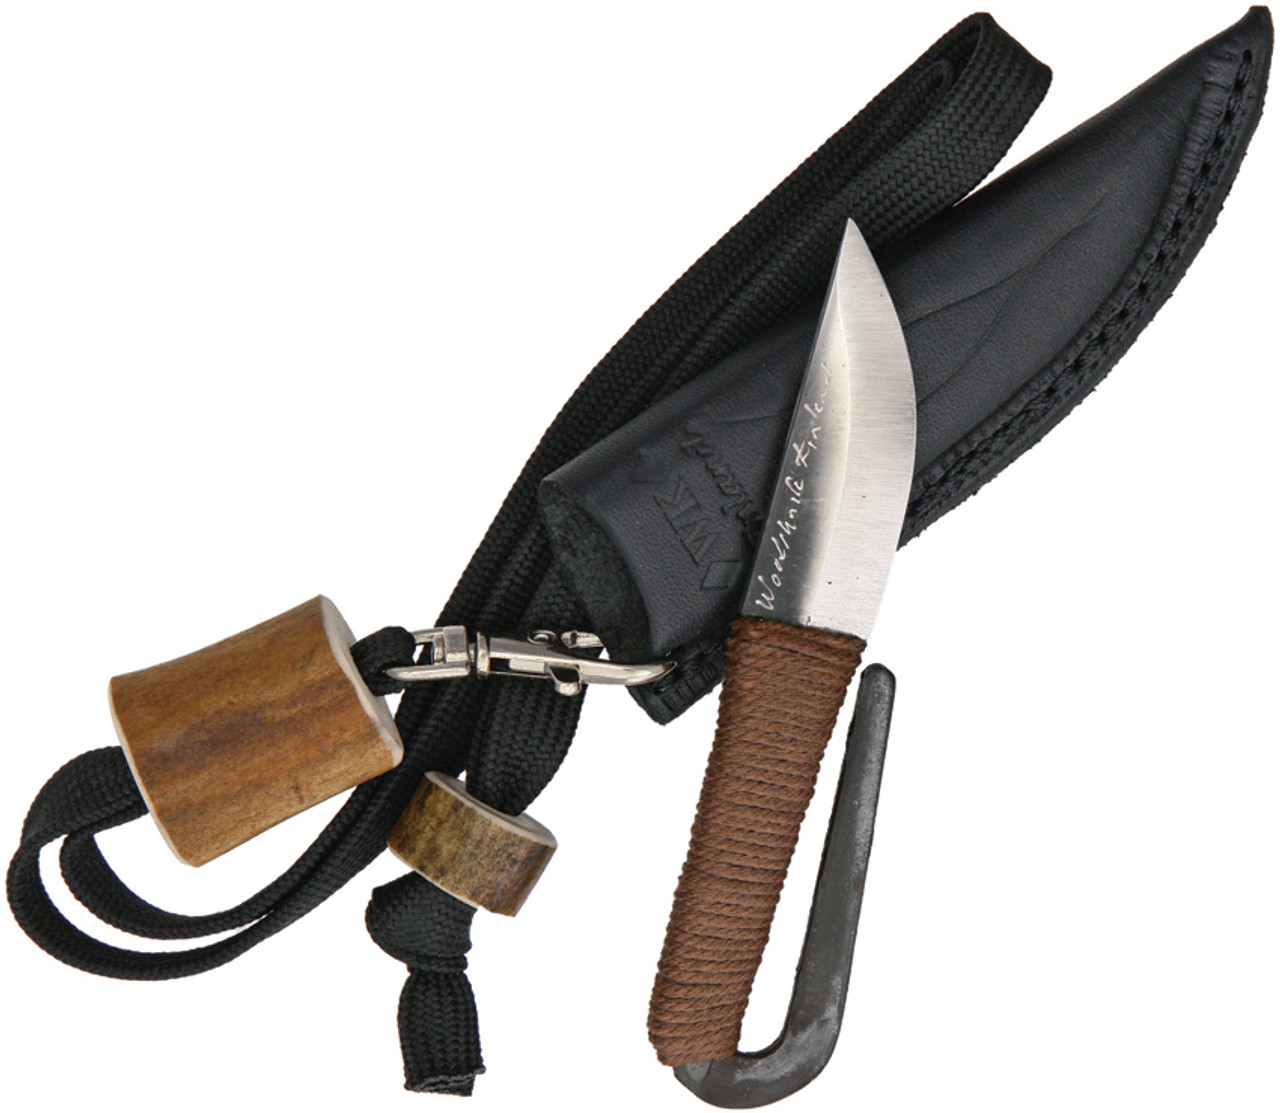 Kellam HM39 Neck Knife